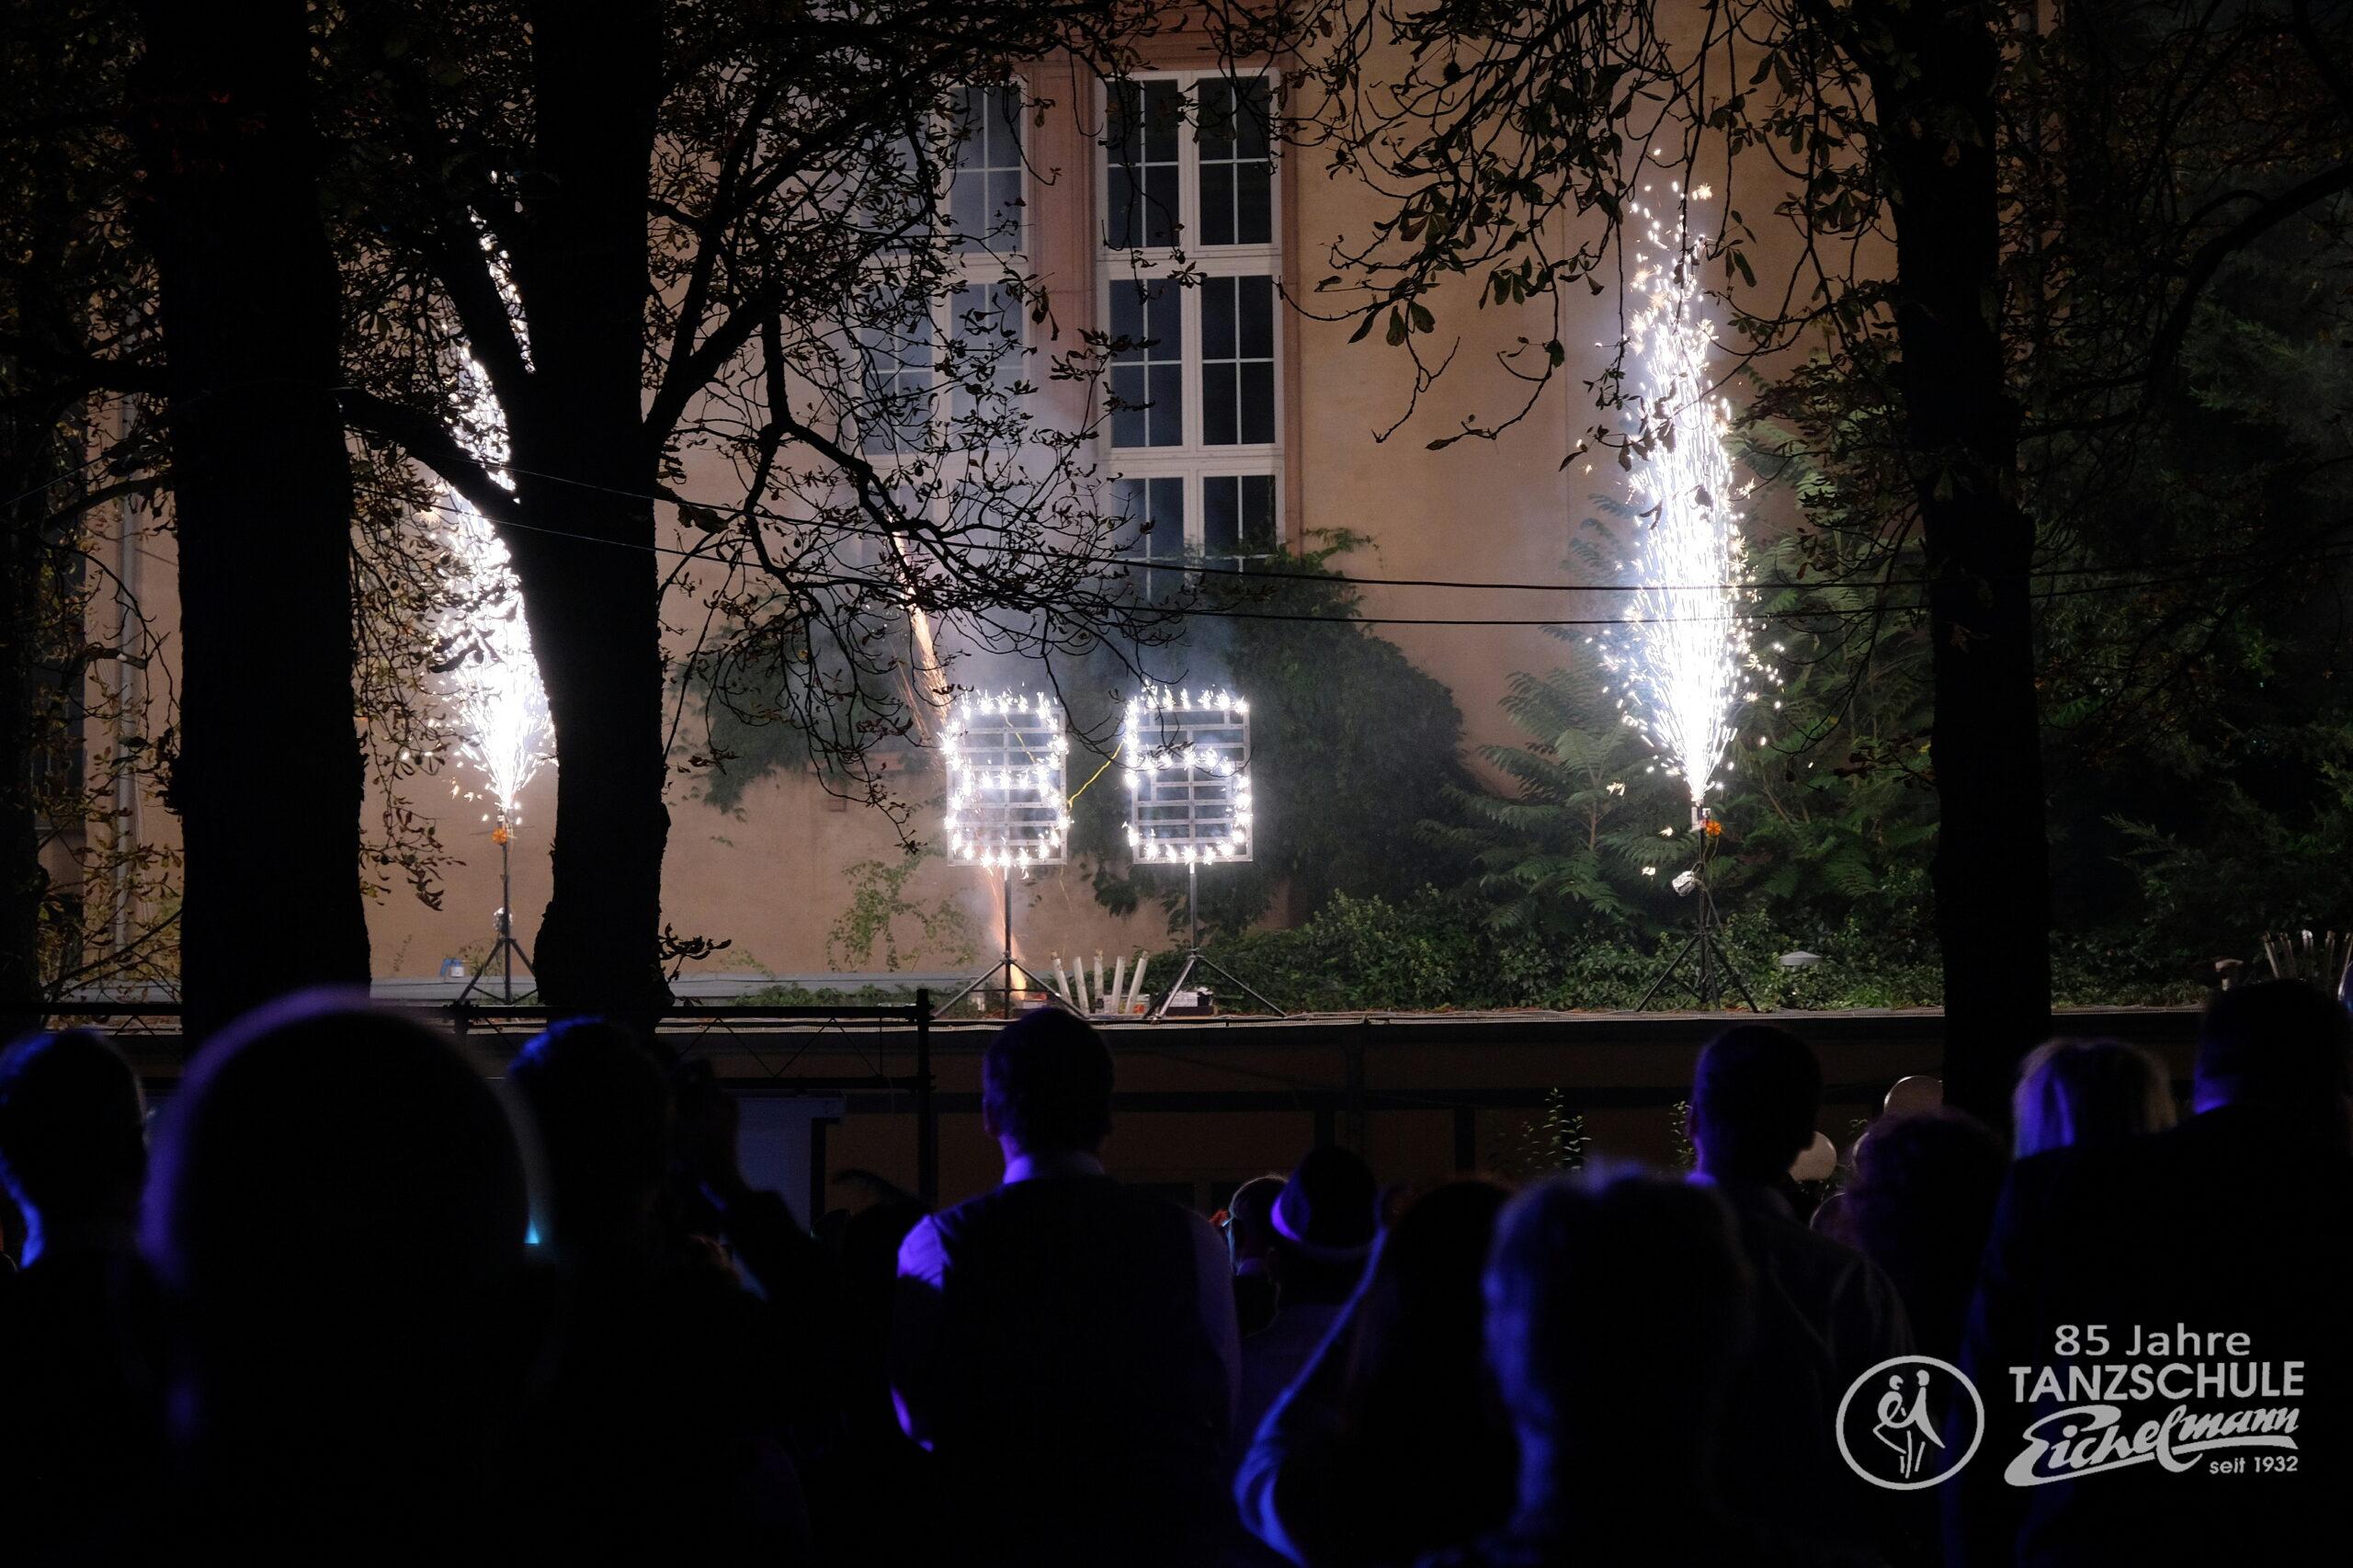 85 Jahre Tanzschule Eichelmann